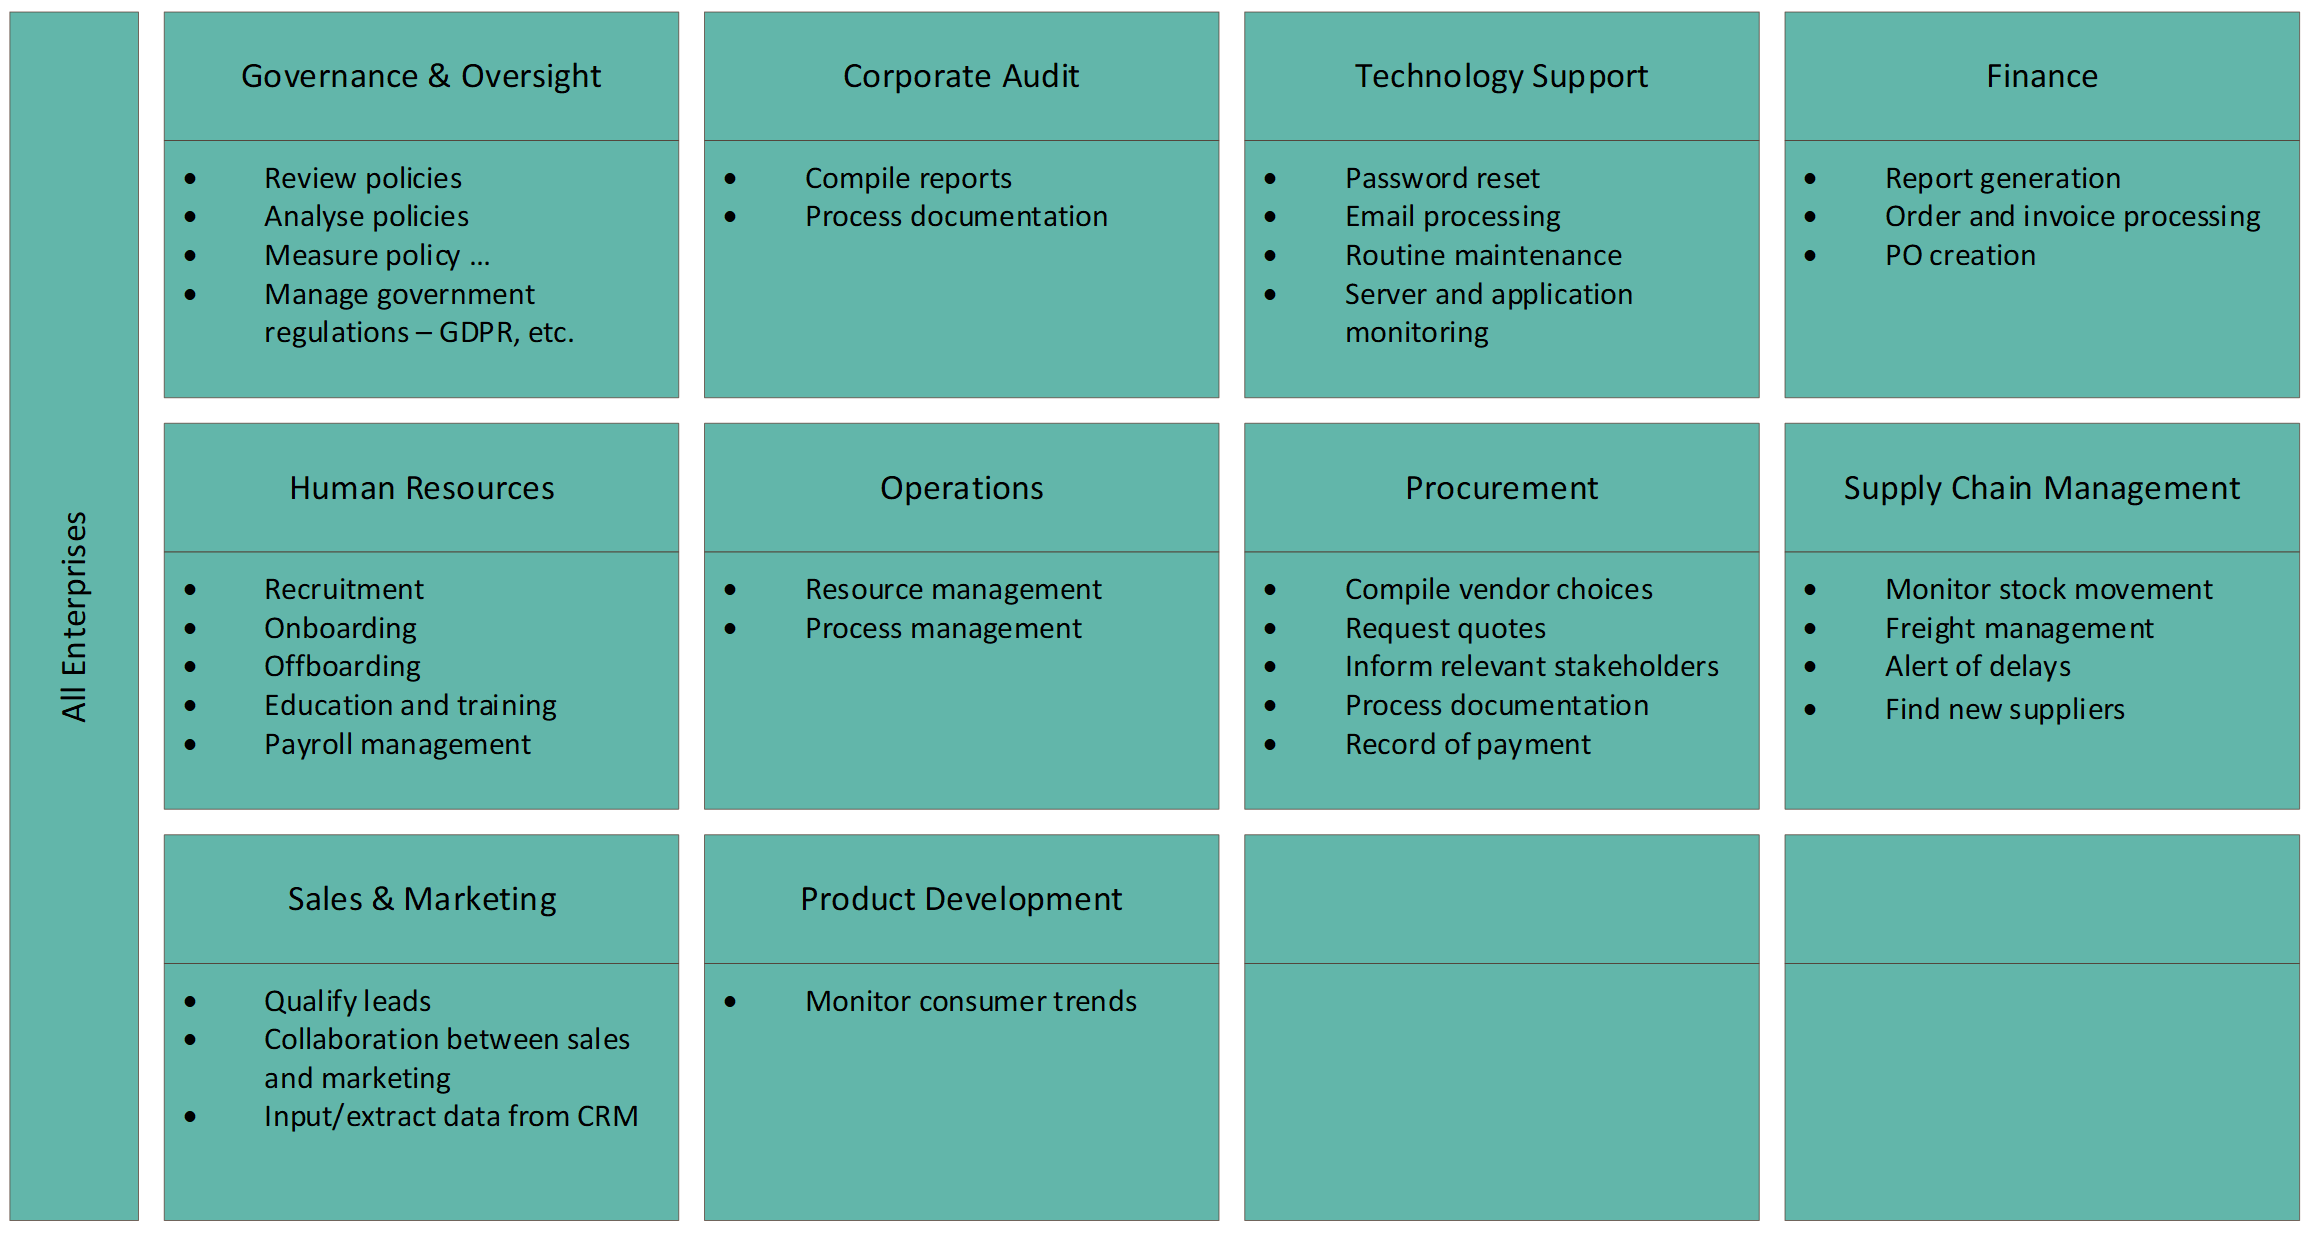 MI00033 - General Business - Image